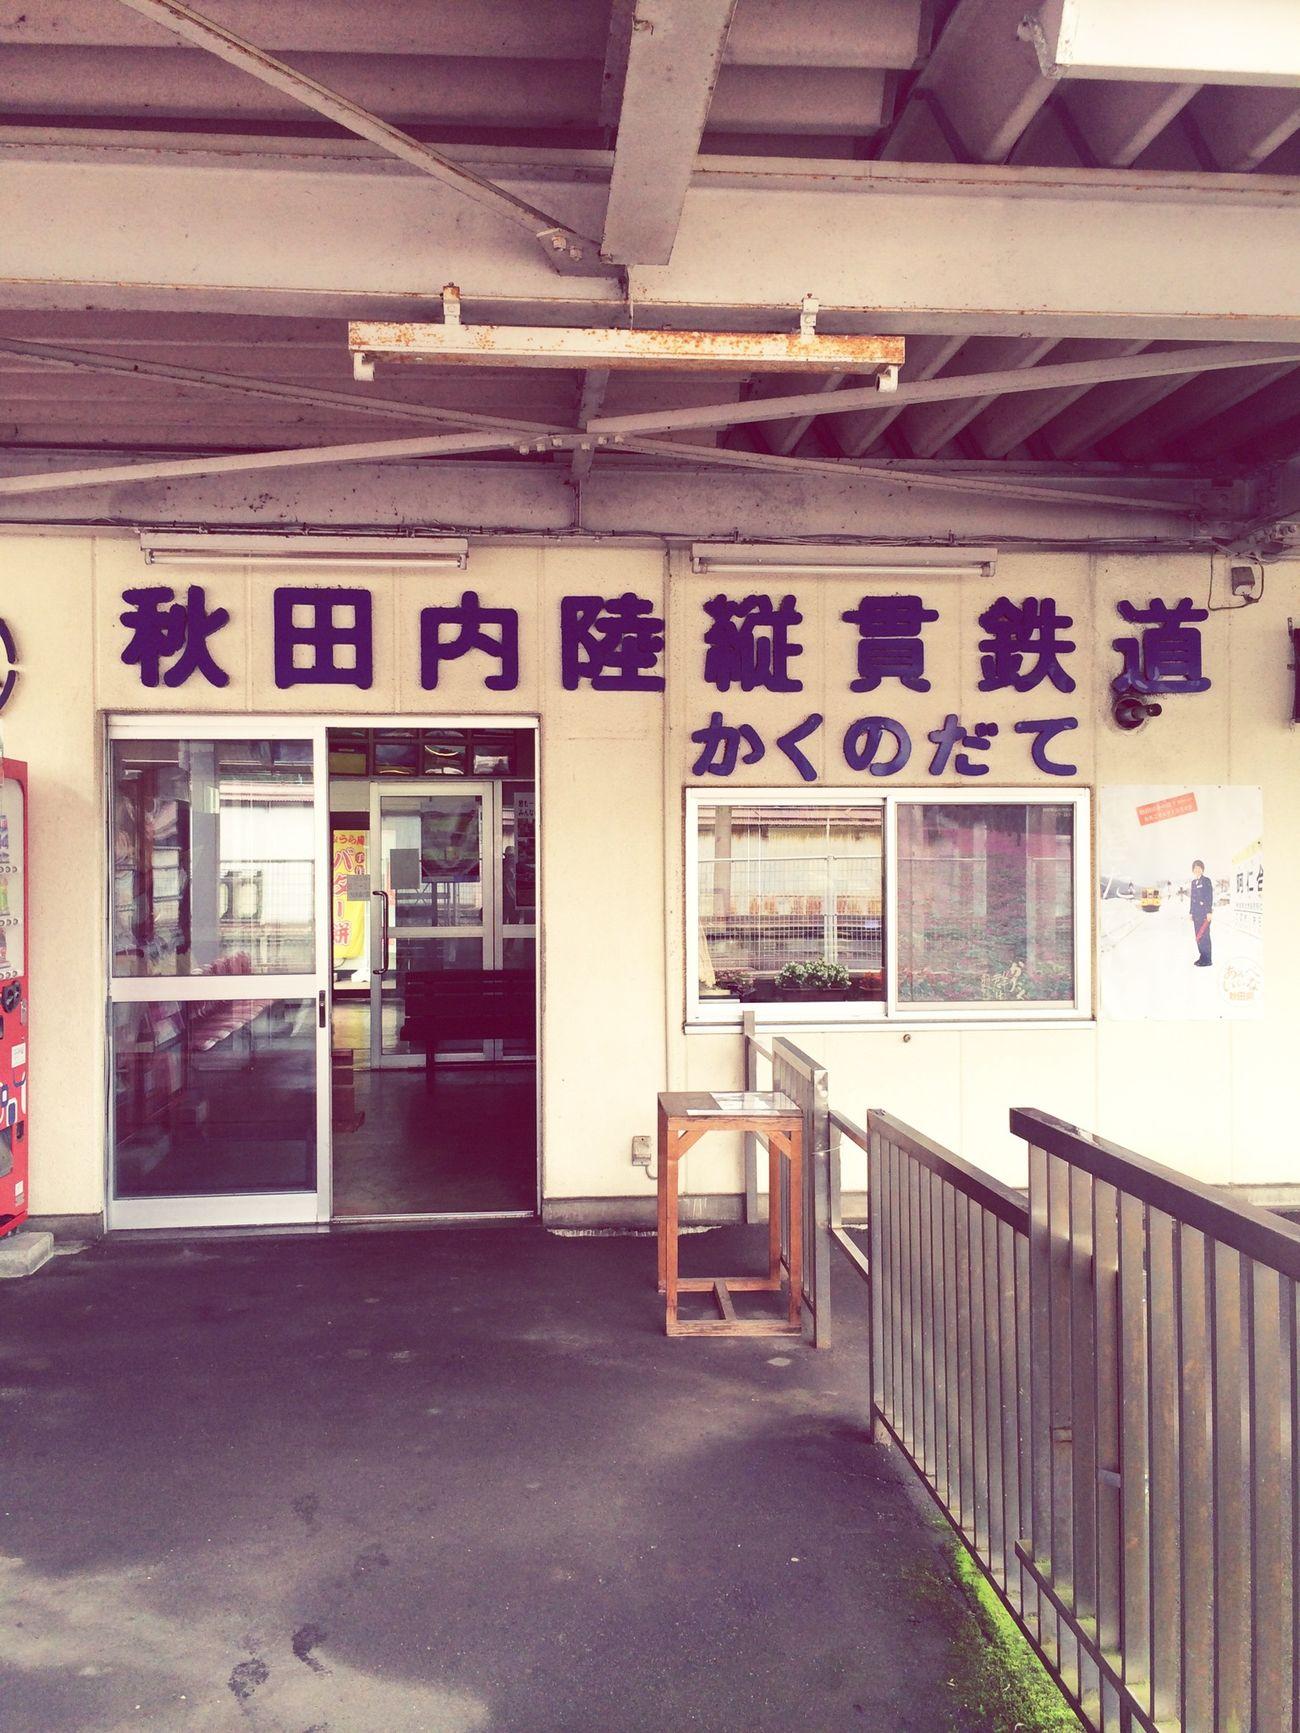 Enjoying Life 楽しい夏鉄道